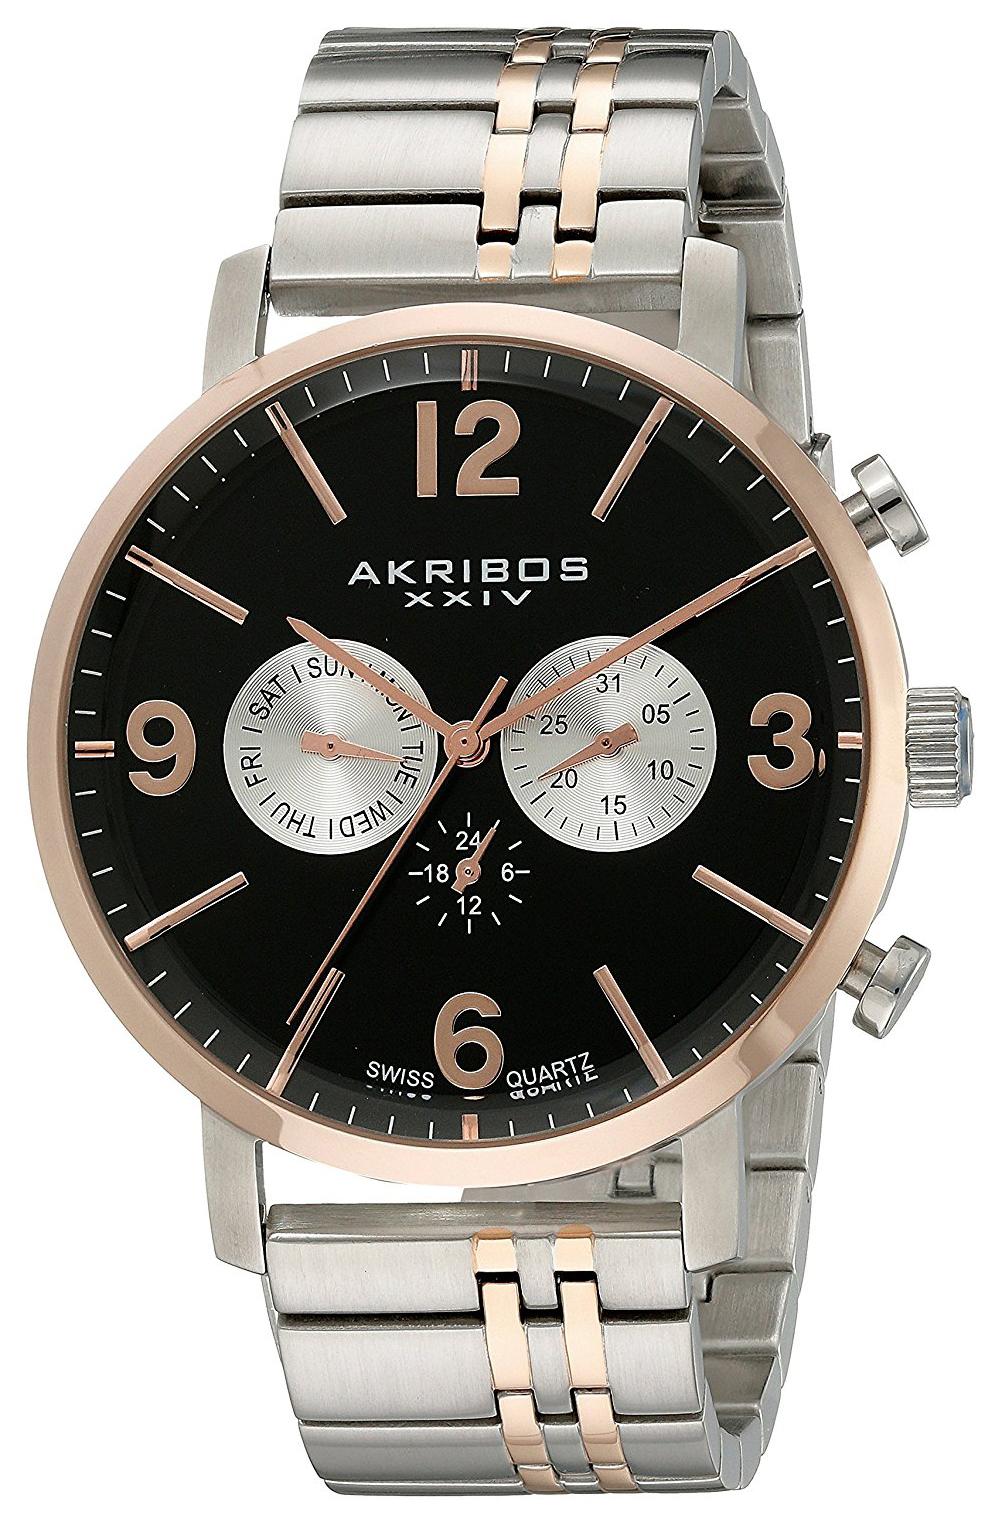 Akribos XXIV Multi-Function Herrklocka AK782TTR Svart/Roséguldstonat - Akribos XXIV